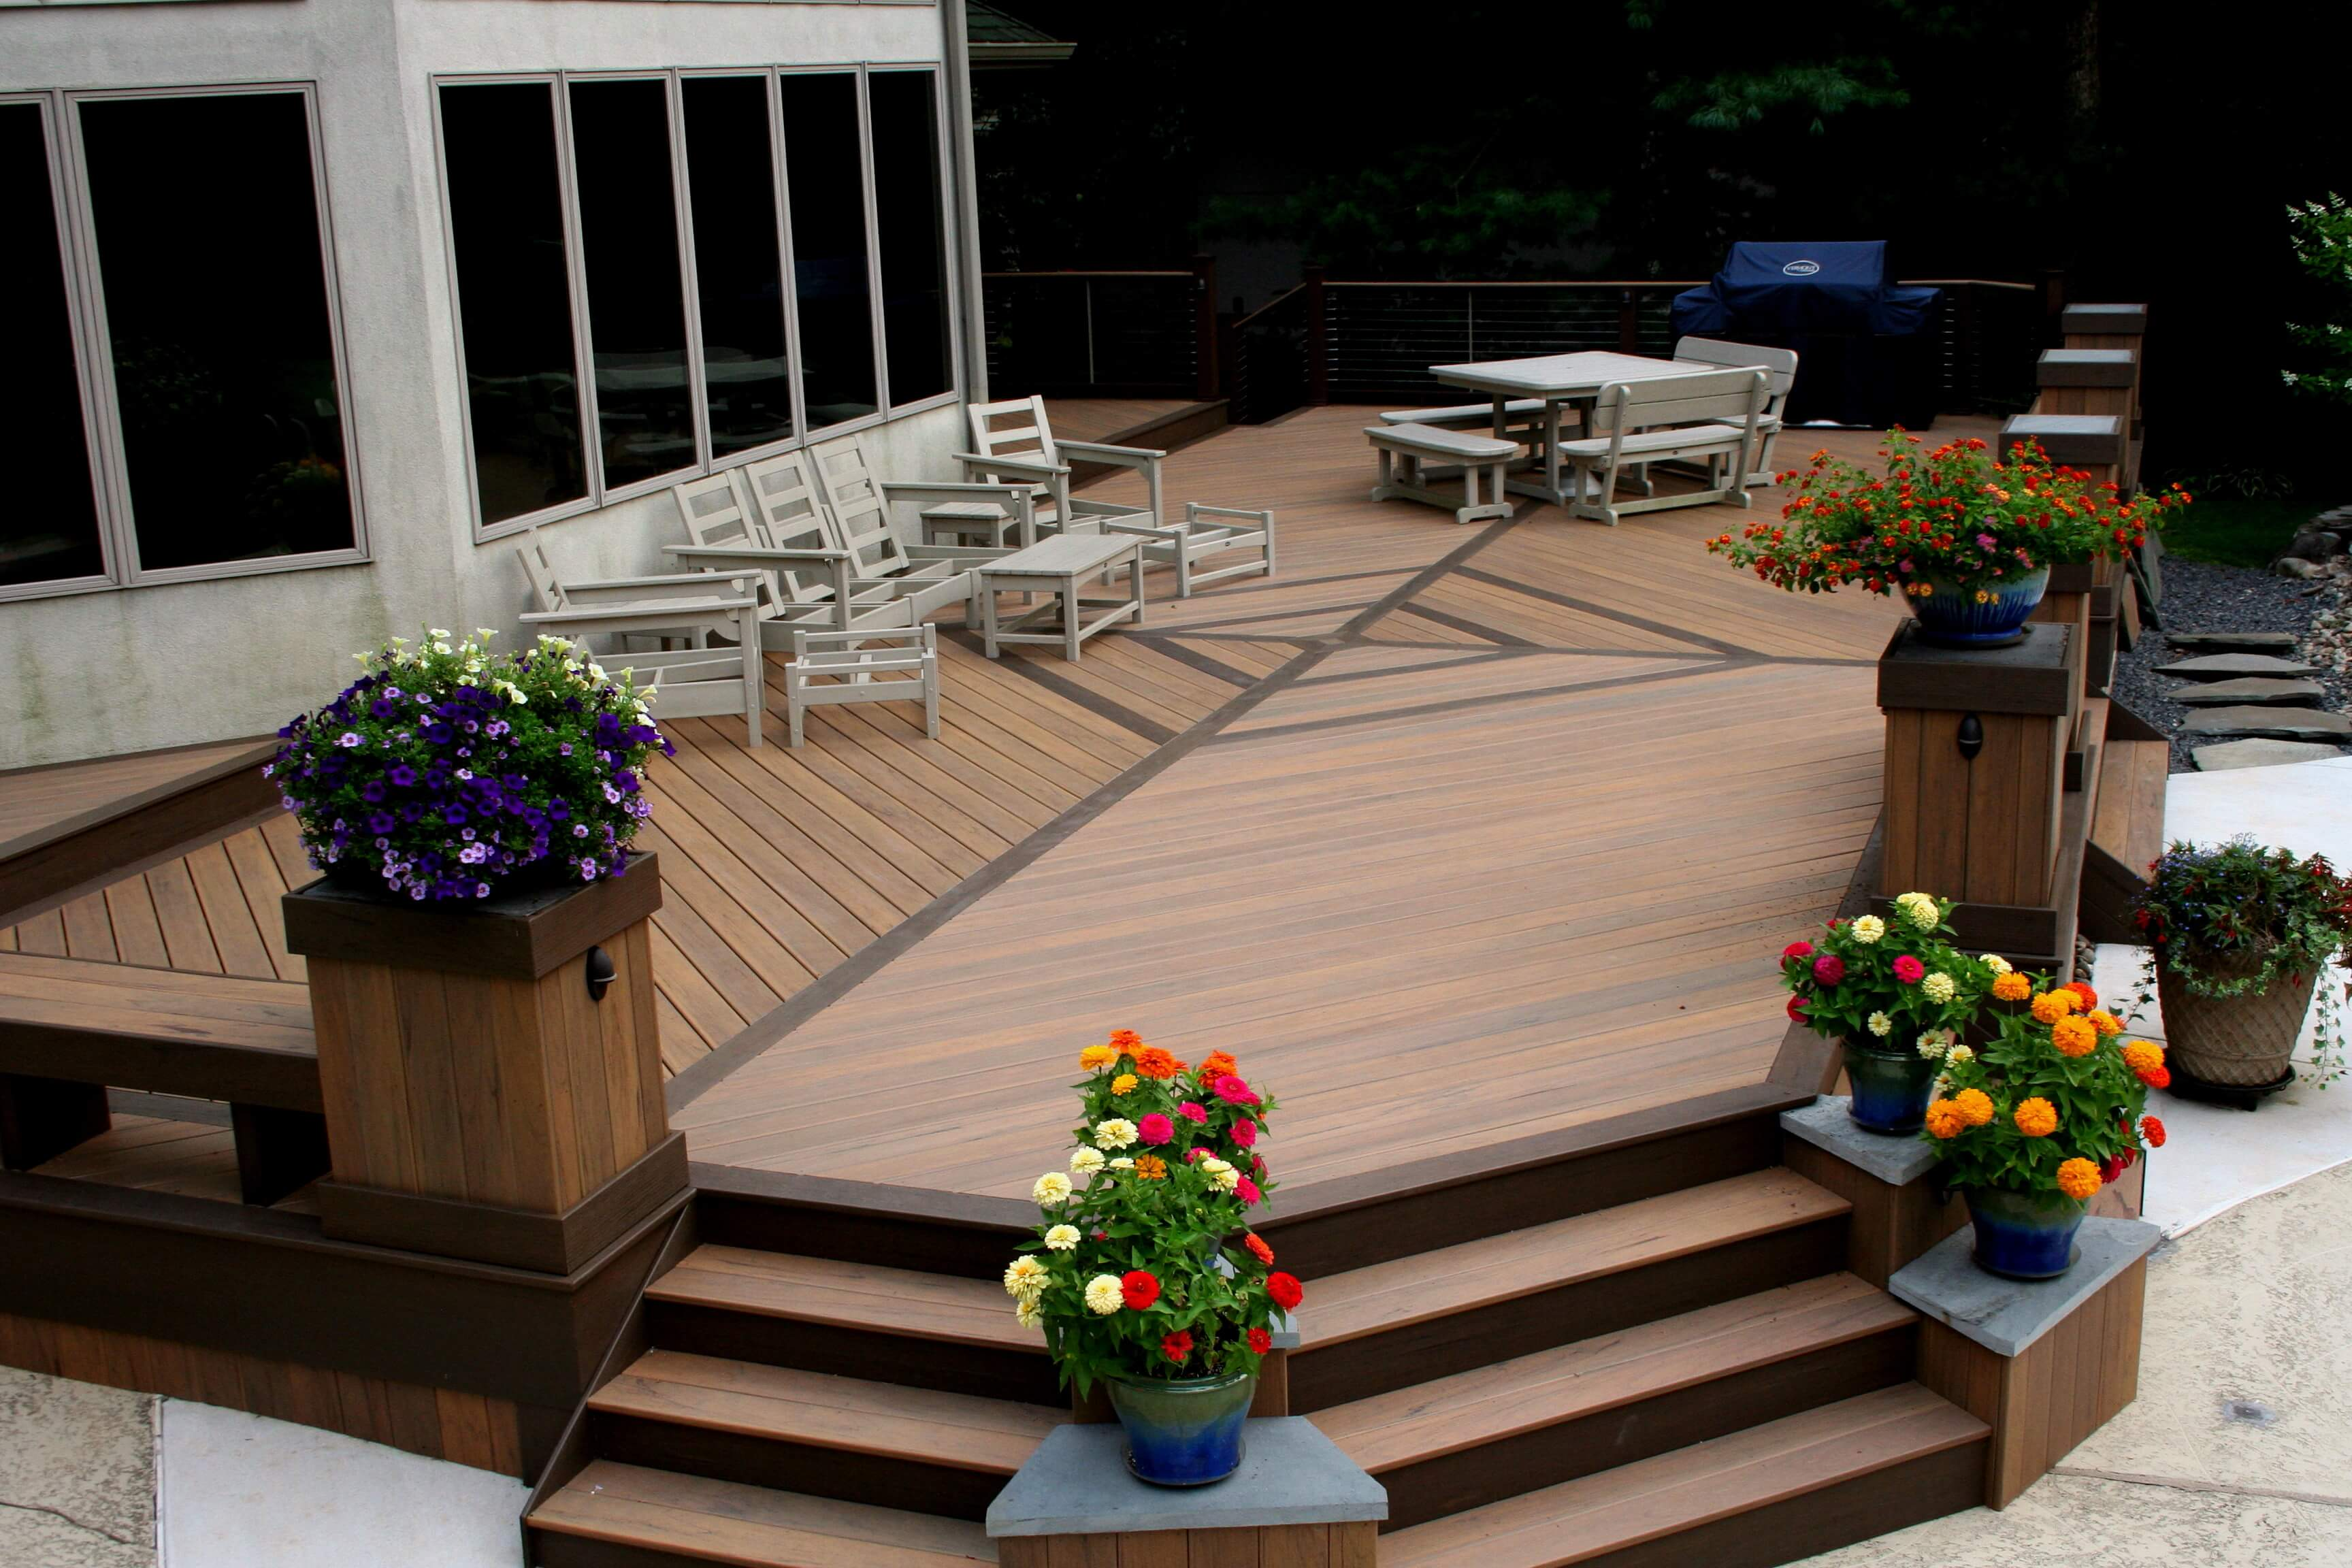 Custom deck with different floor designs